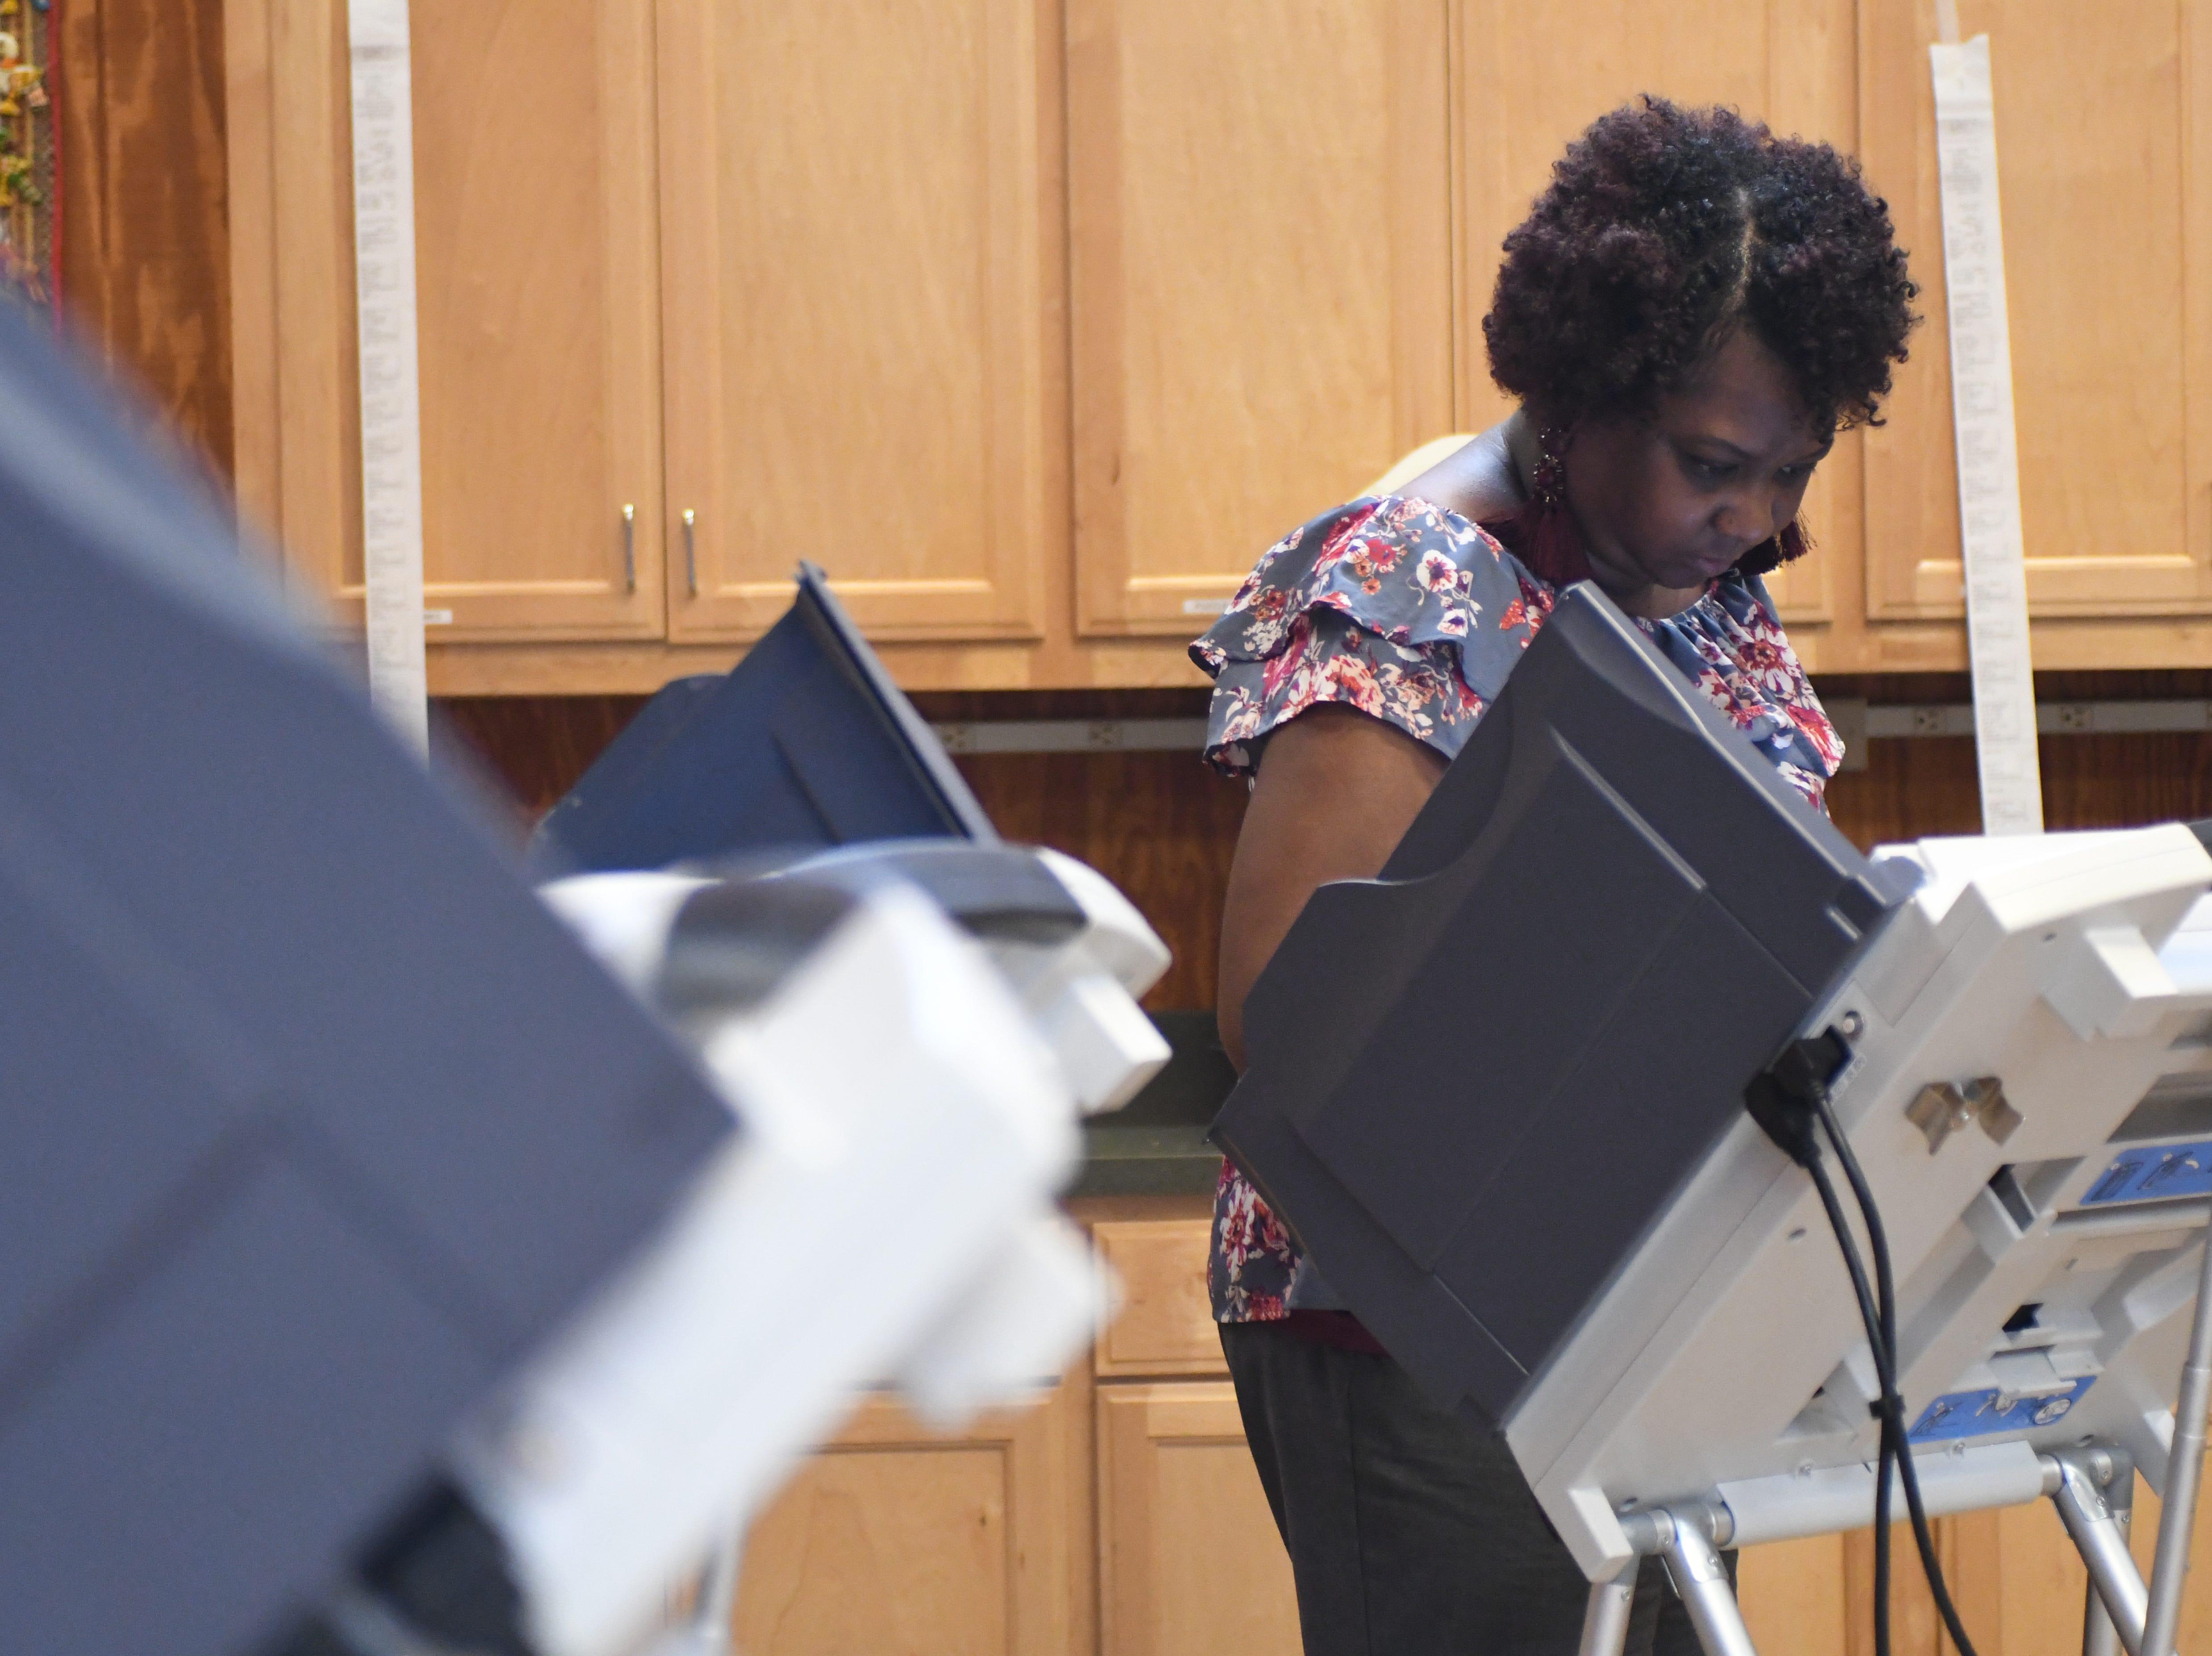 Hattiesburg resident Felisha Toney cast her ballot during the midterm elections at the Kamper Park precinct on Tuesday, November 6, 2018.